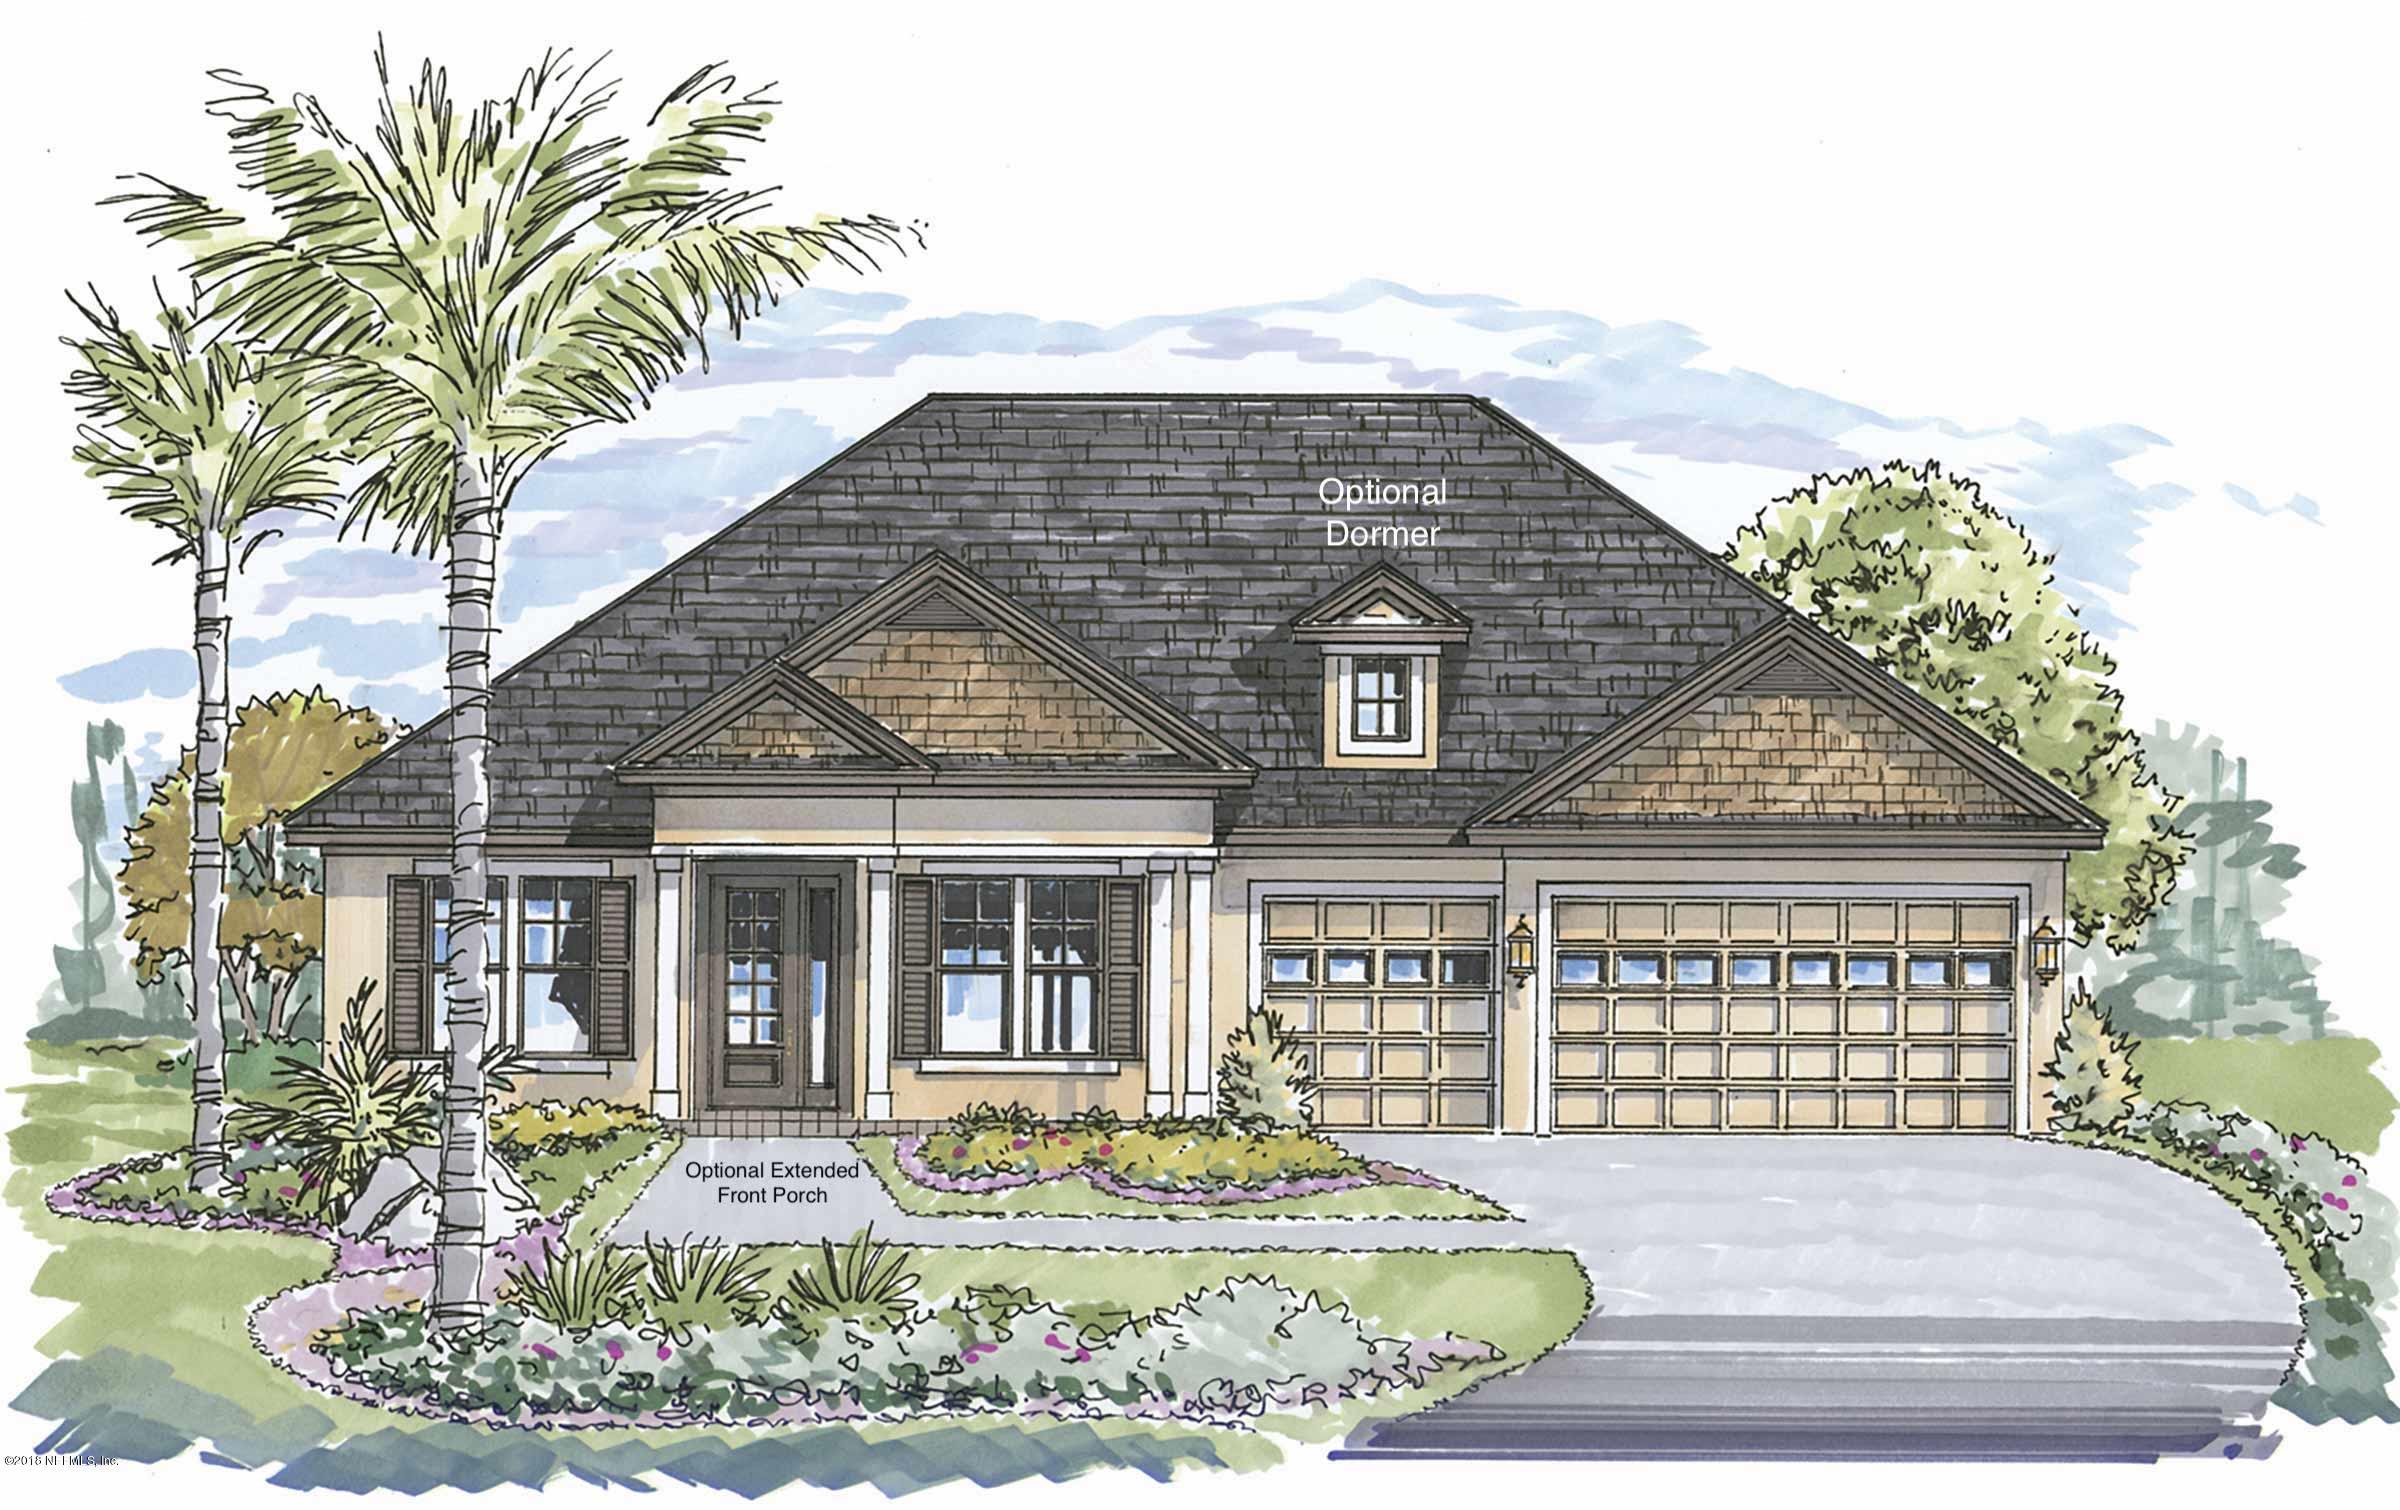 514 LATROBE, ST AUGUSTINE, FLORIDA 32095, 3 Bedrooms Bedrooms, ,3 BathroomsBathrooms,Residential - single family,For sale,LATROBE,949628